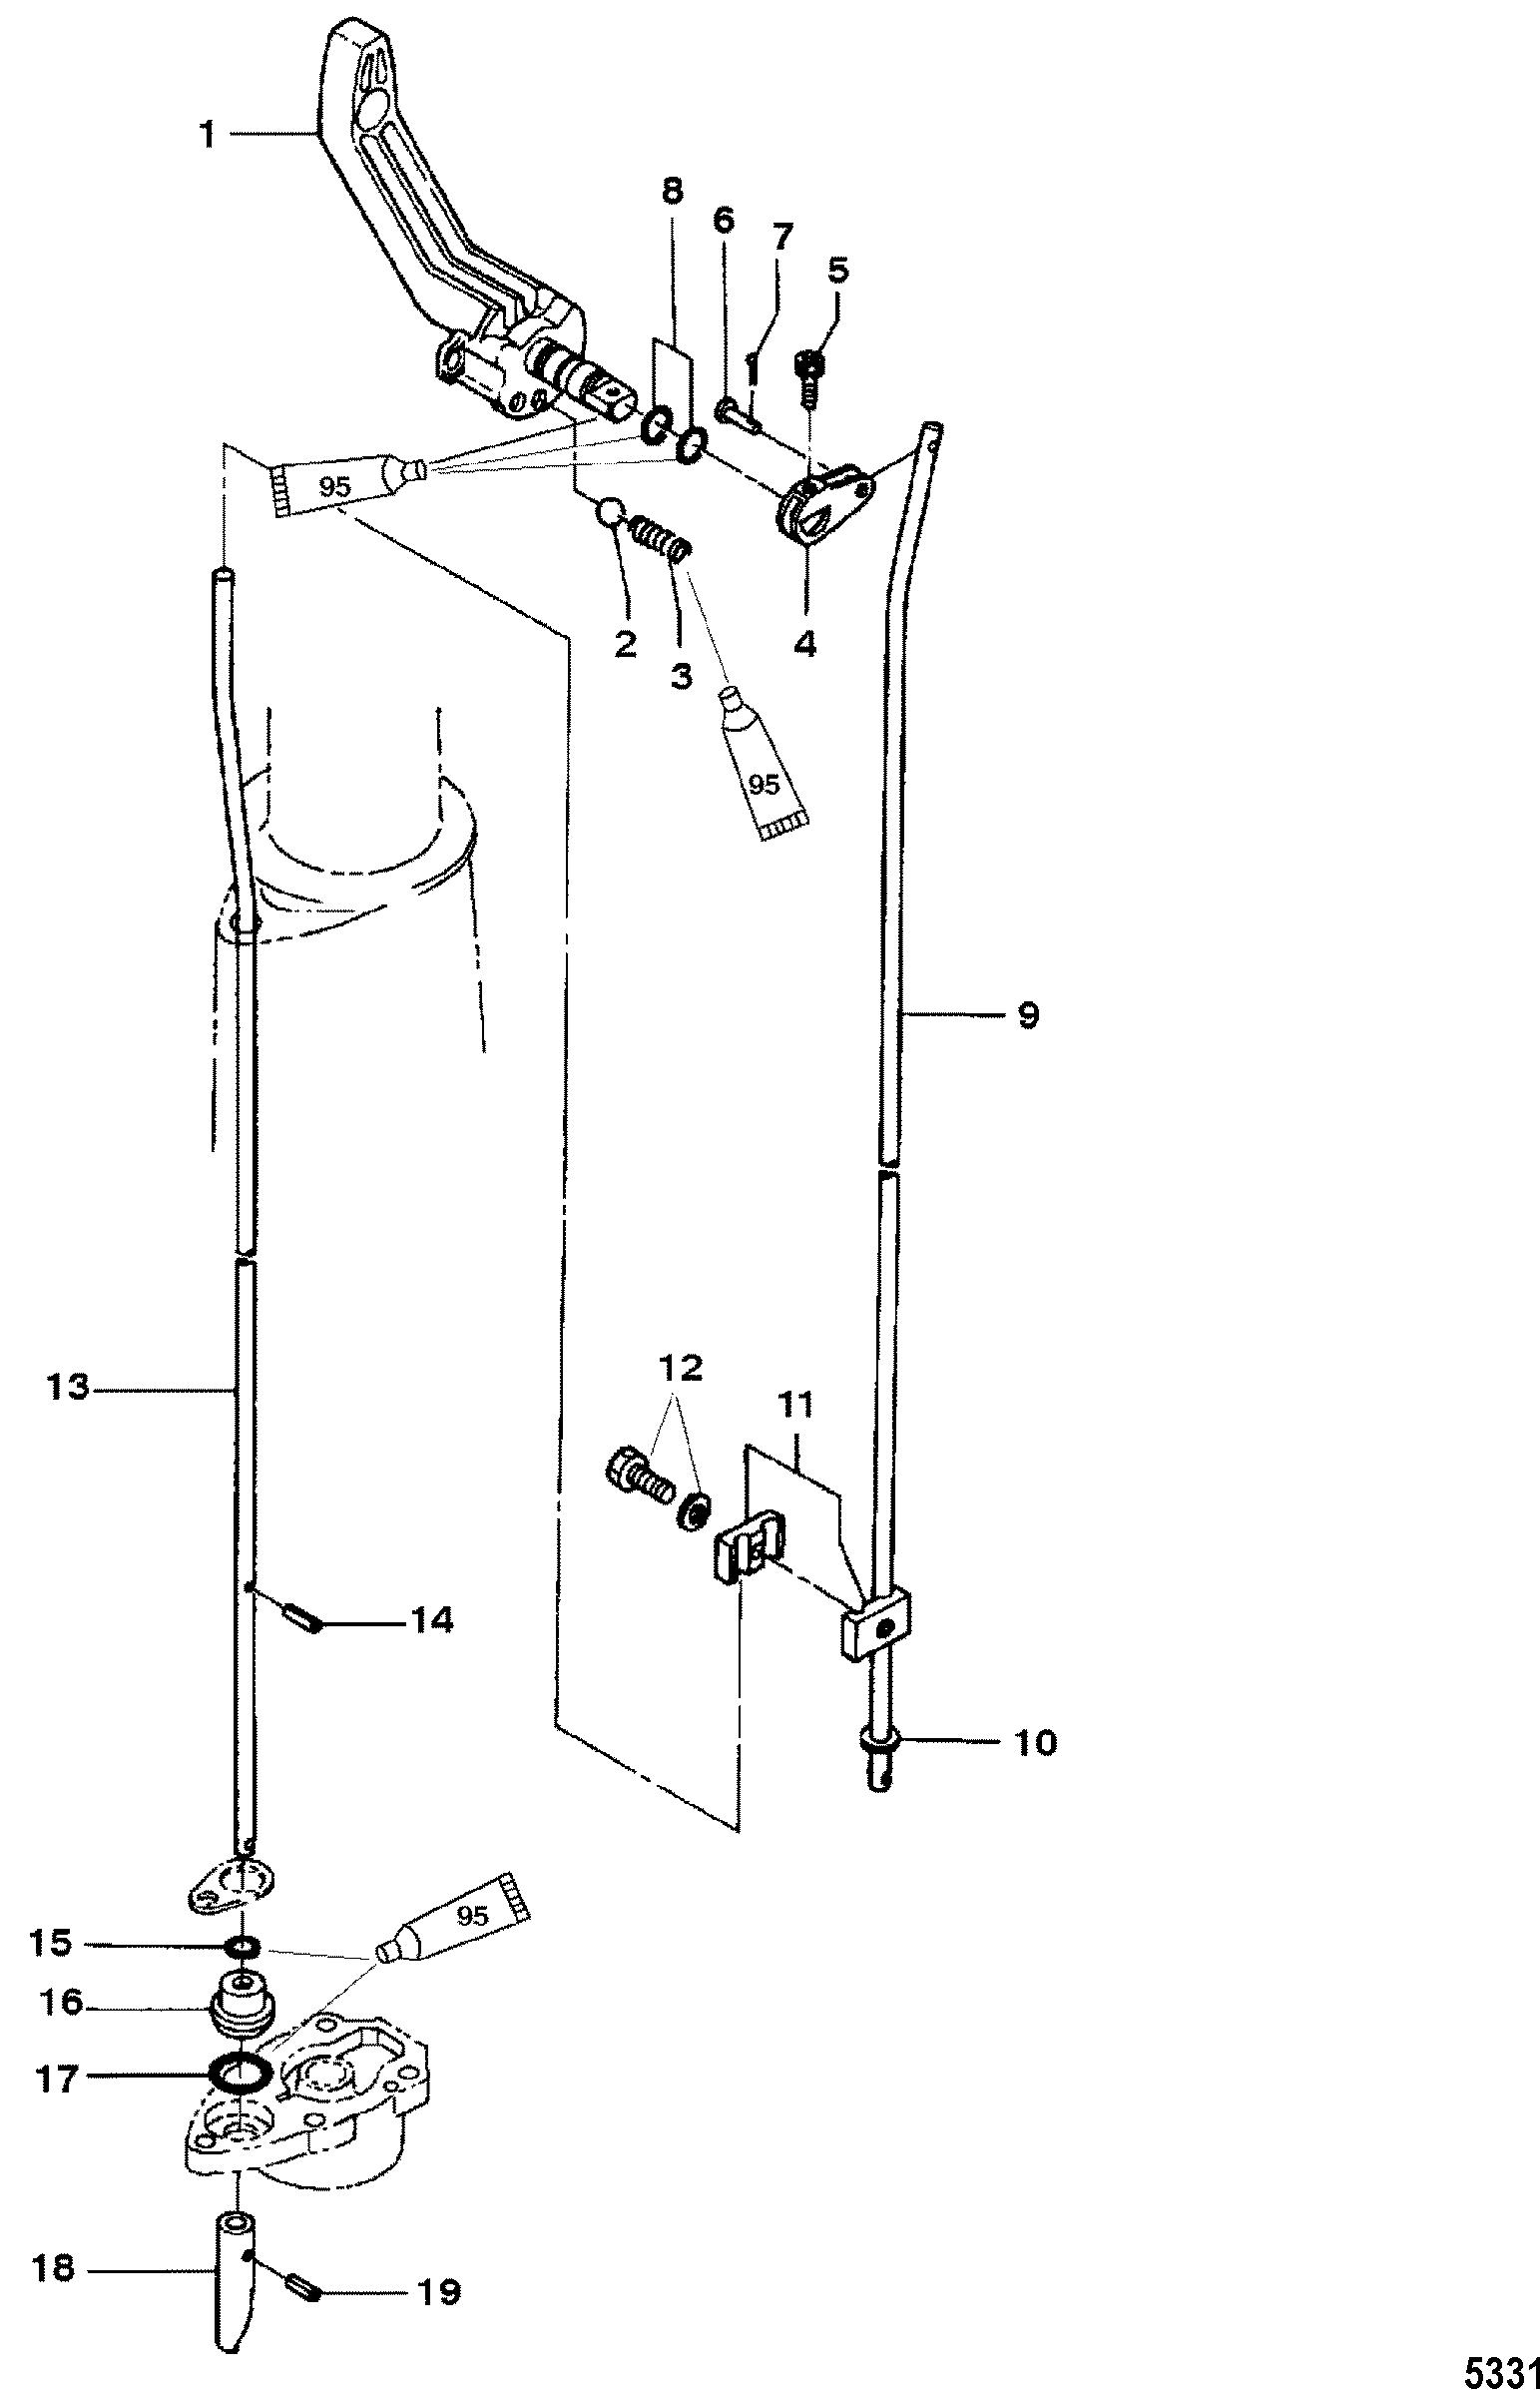 Каталог запчастей MARINER 4 (2-STROKE) 0P401000 & Up